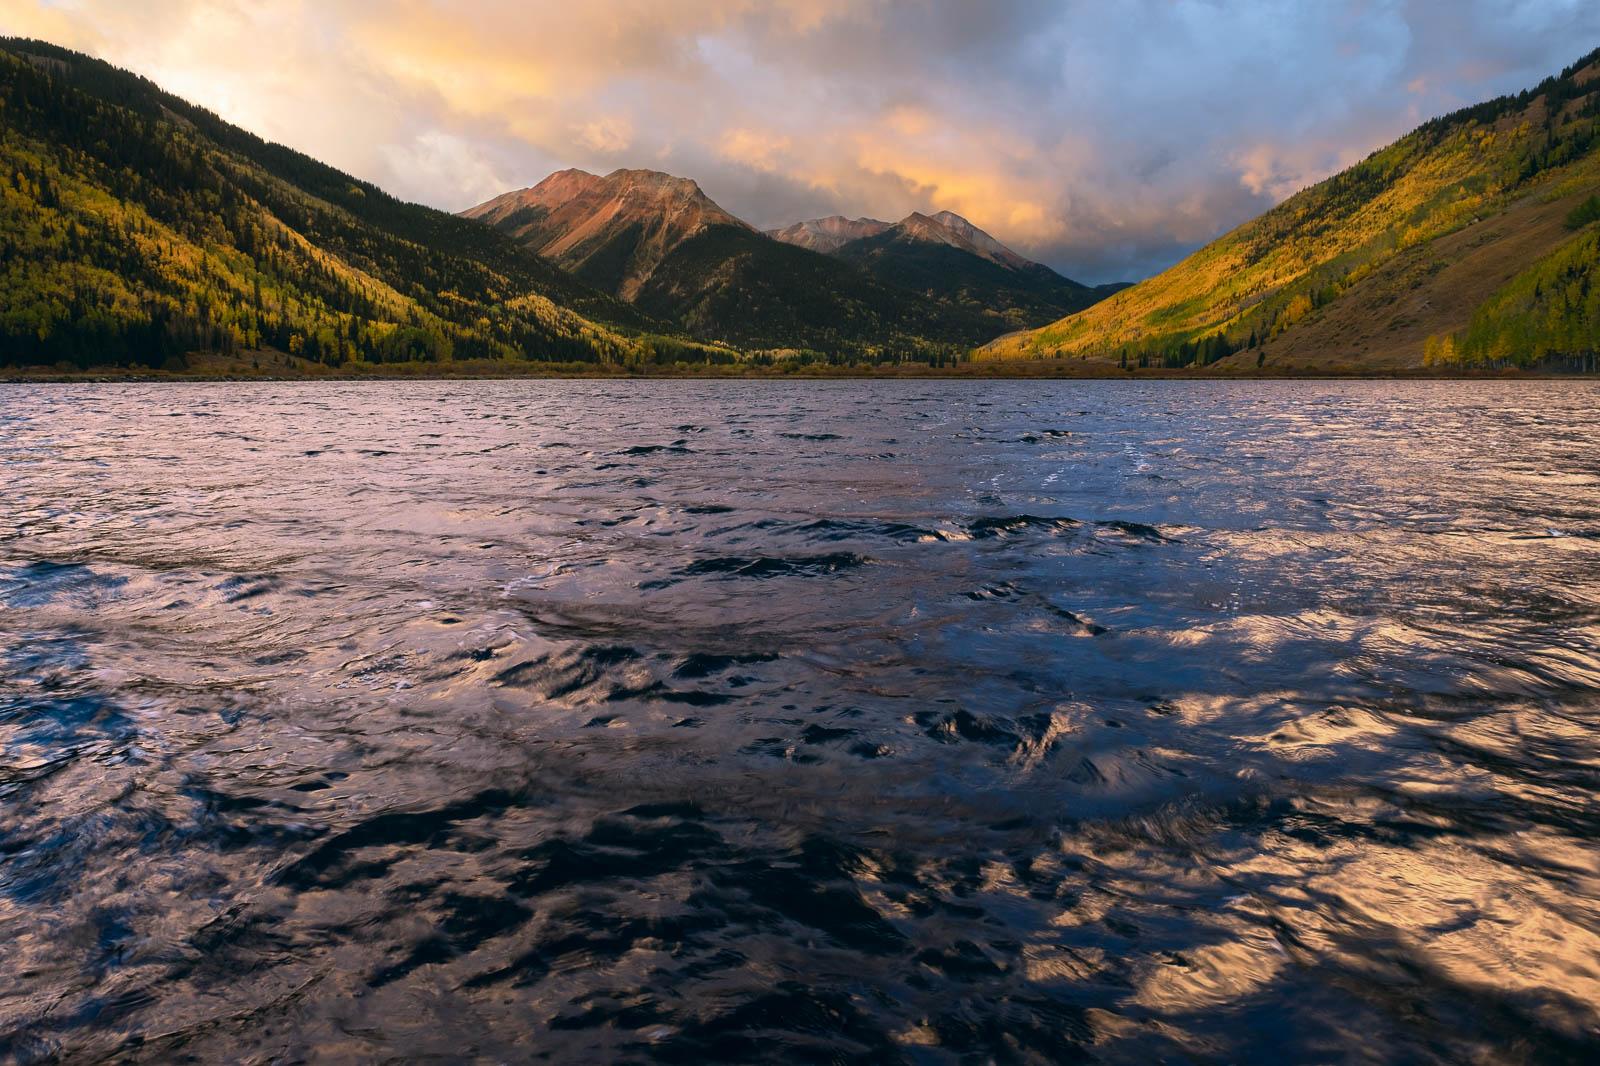 Time, aspen, autumn, blue, colorado, crystal lake, dramatic, fall, landscape orientation, red mountain, rocky mountains, san...